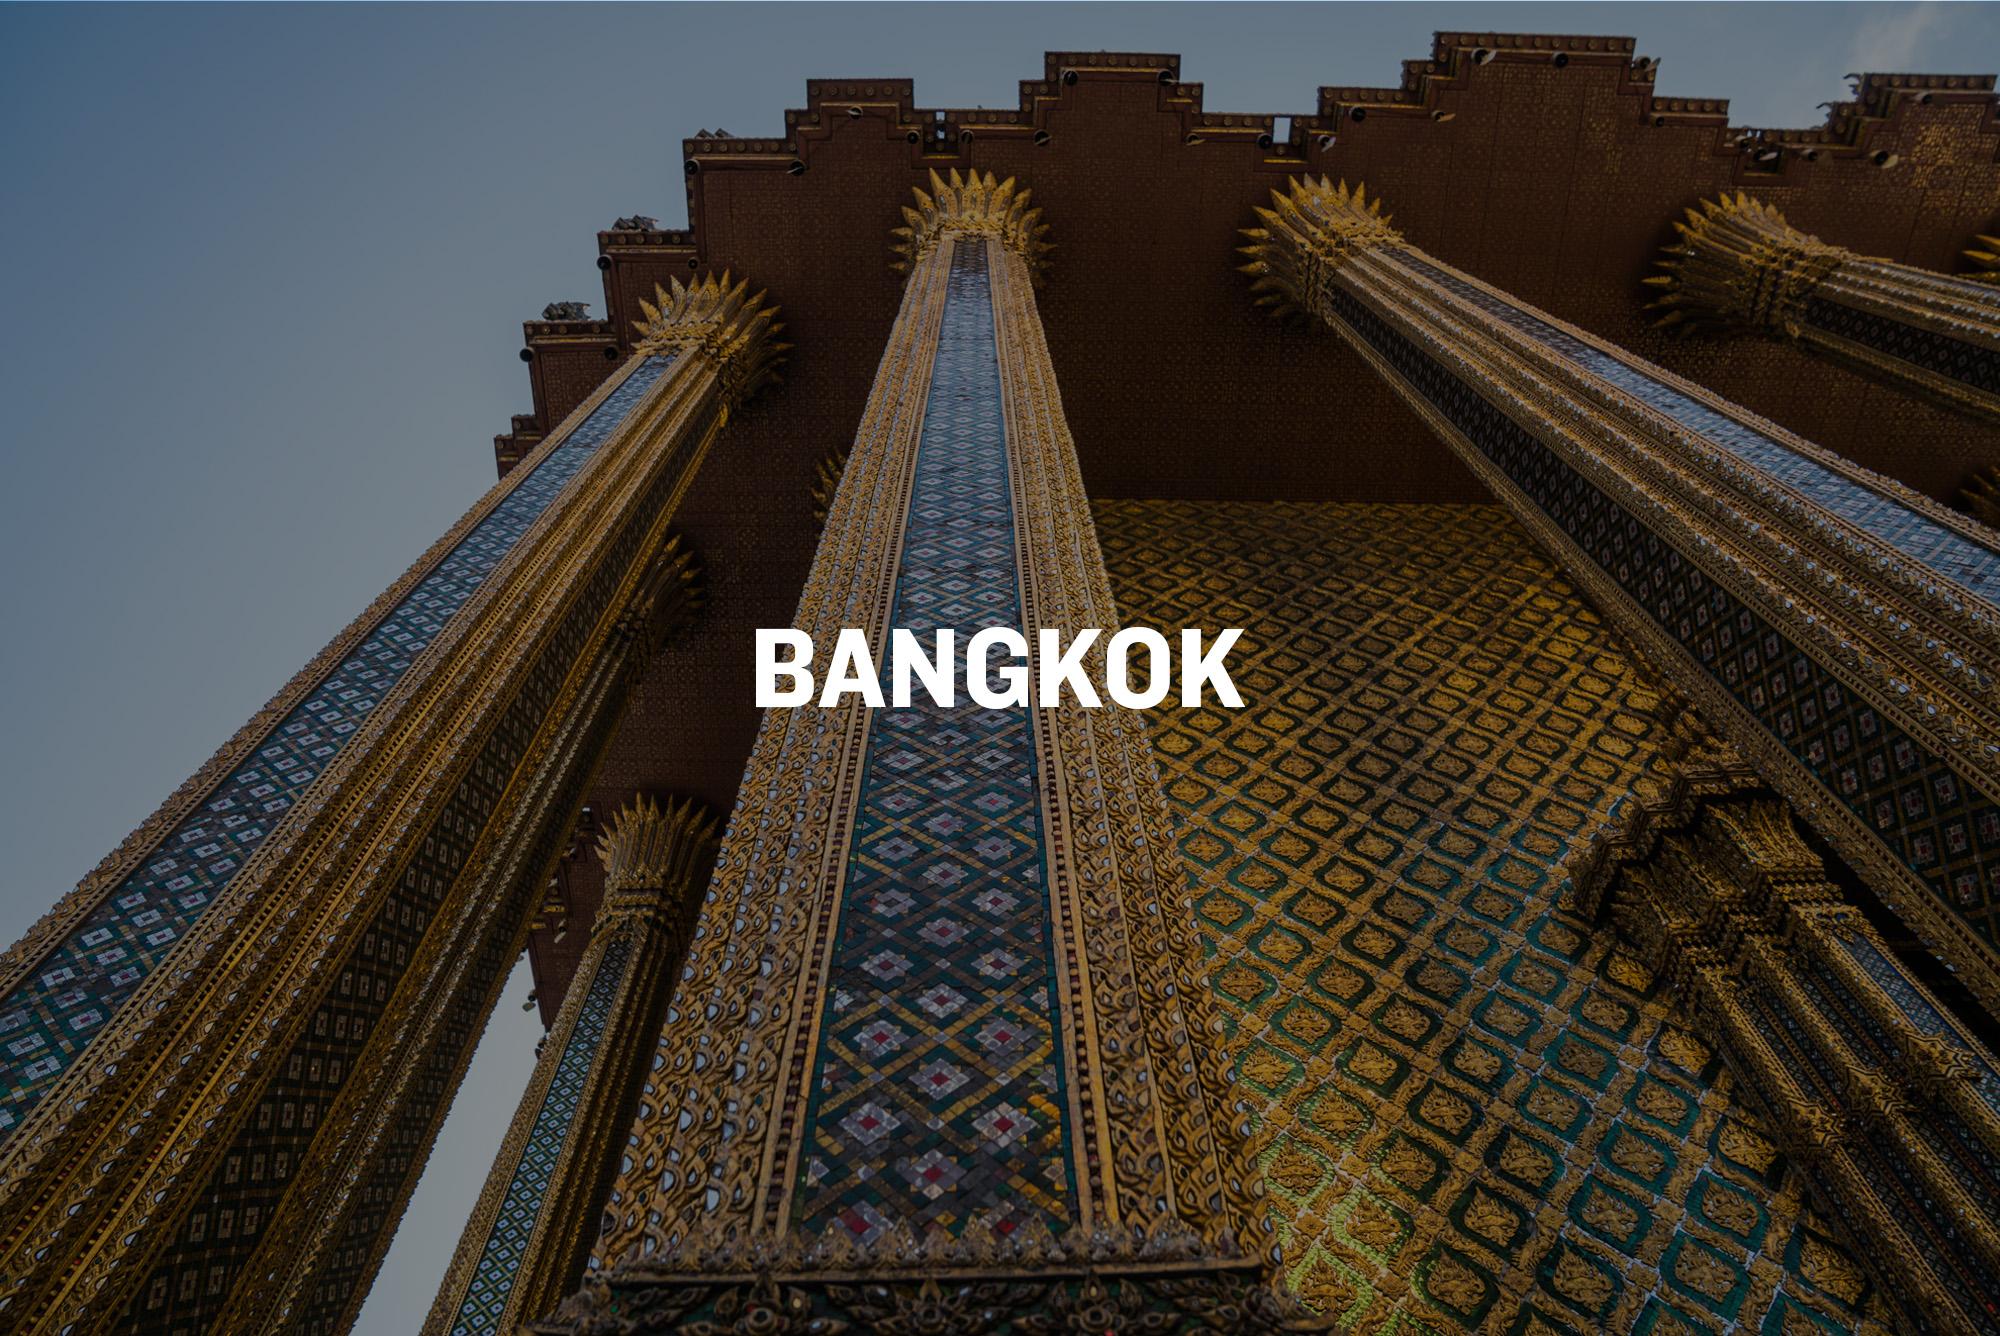 bangkokgallerycover.jpg